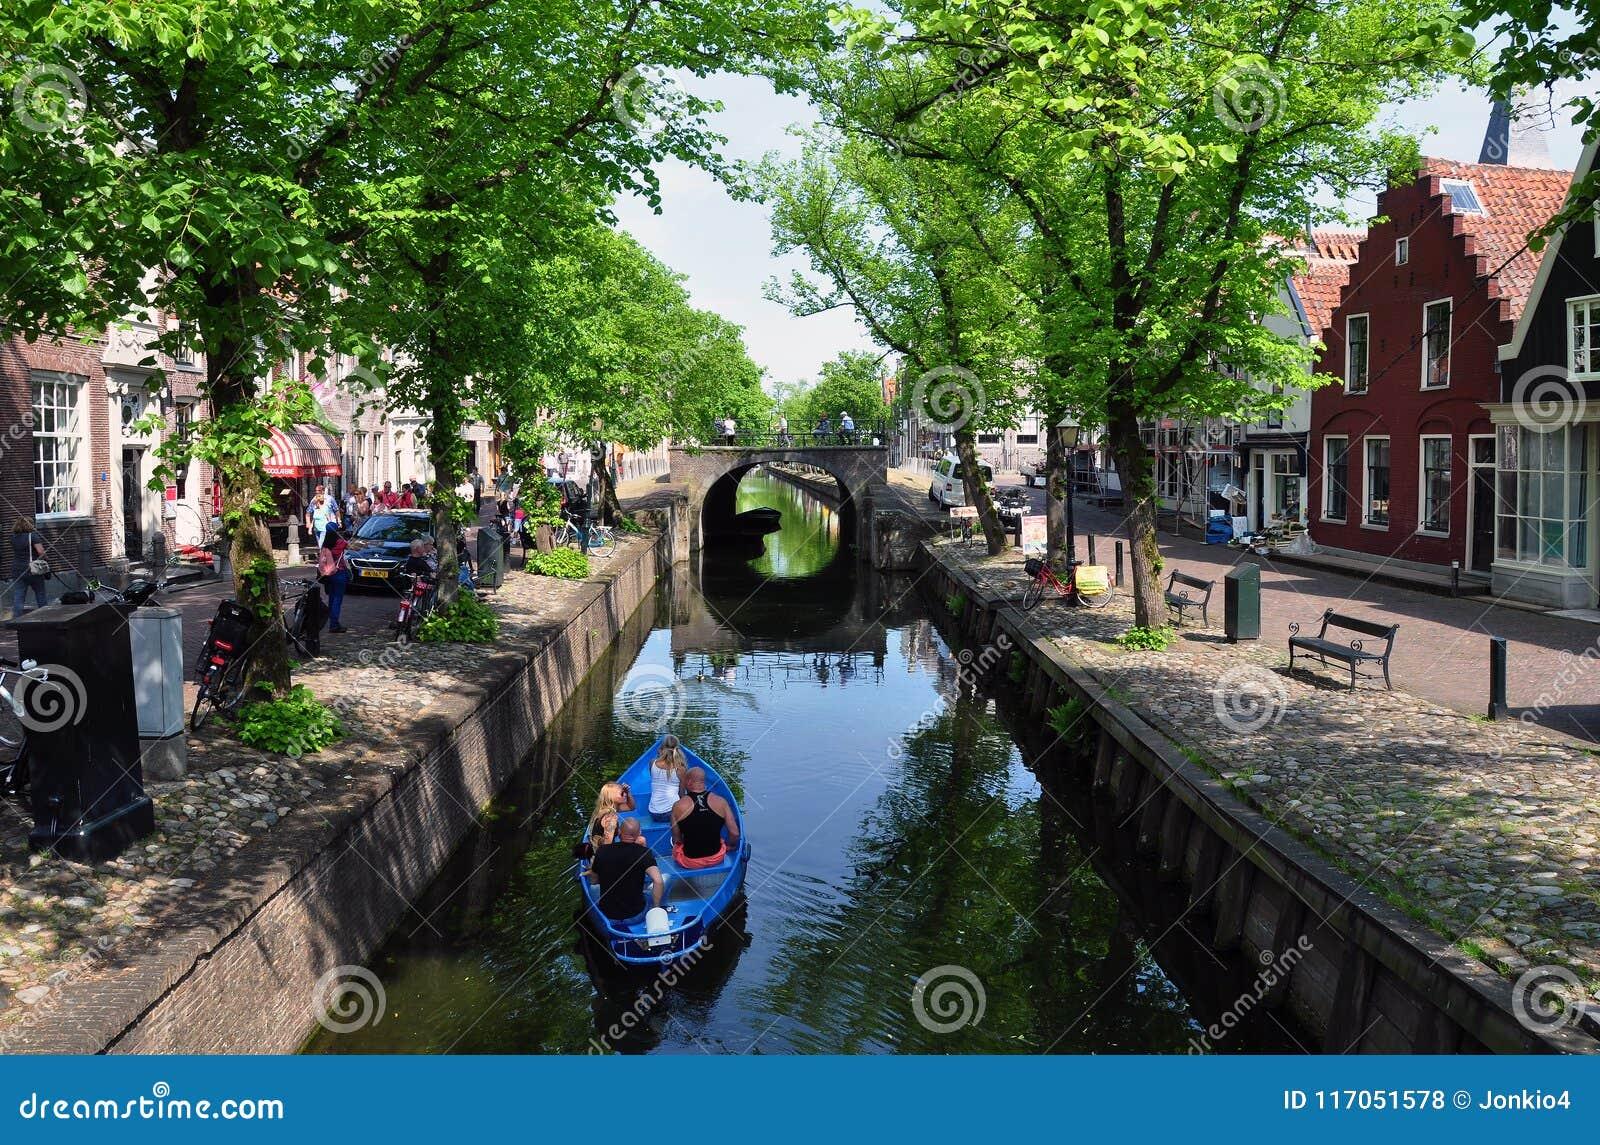 Сцена канала в Эдамере, Нидерландах